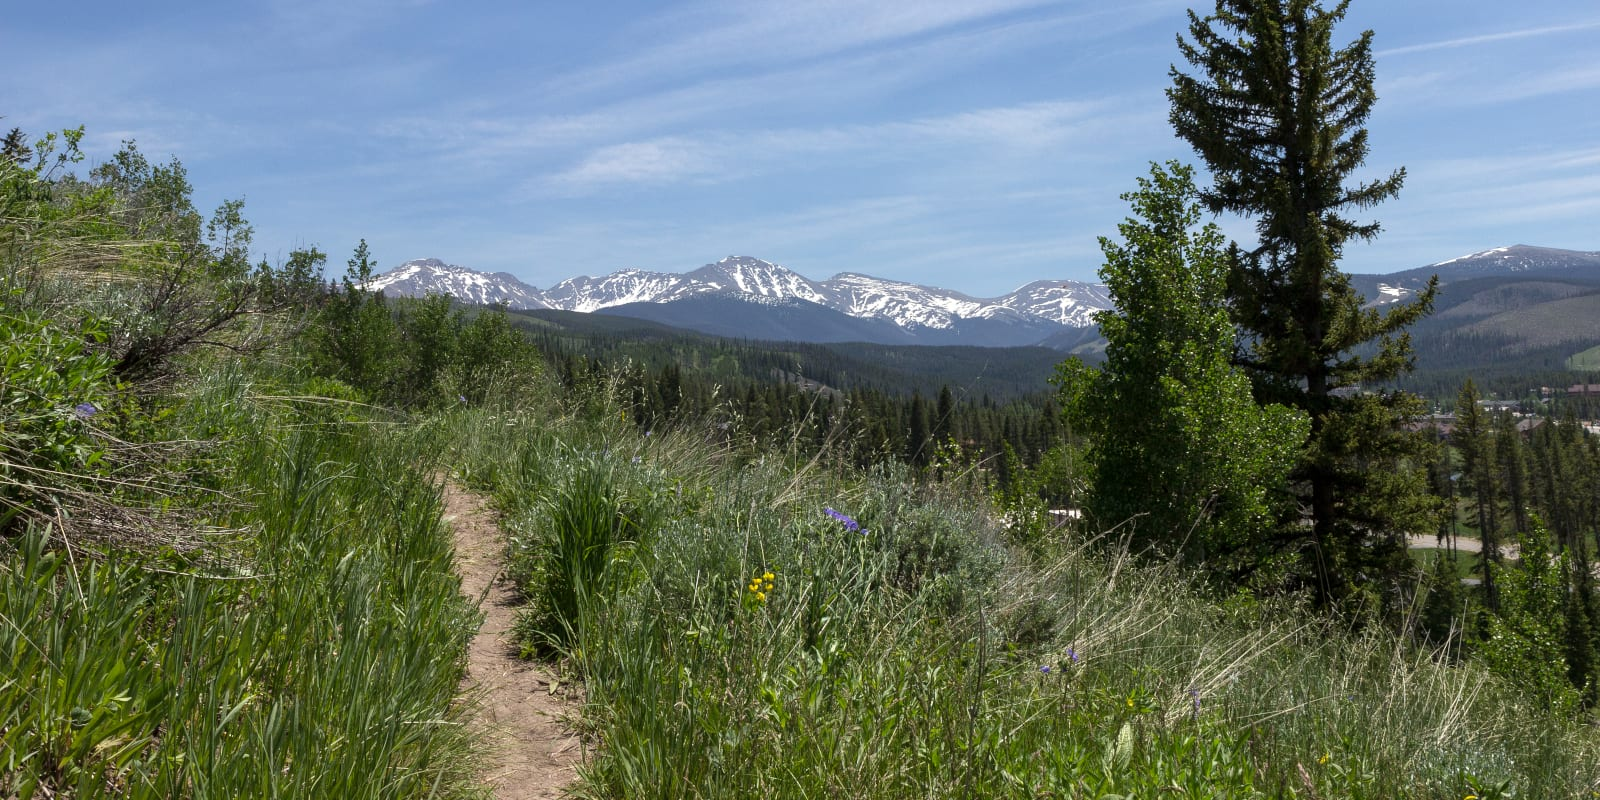 Winter Park Colorado Hiking Trail